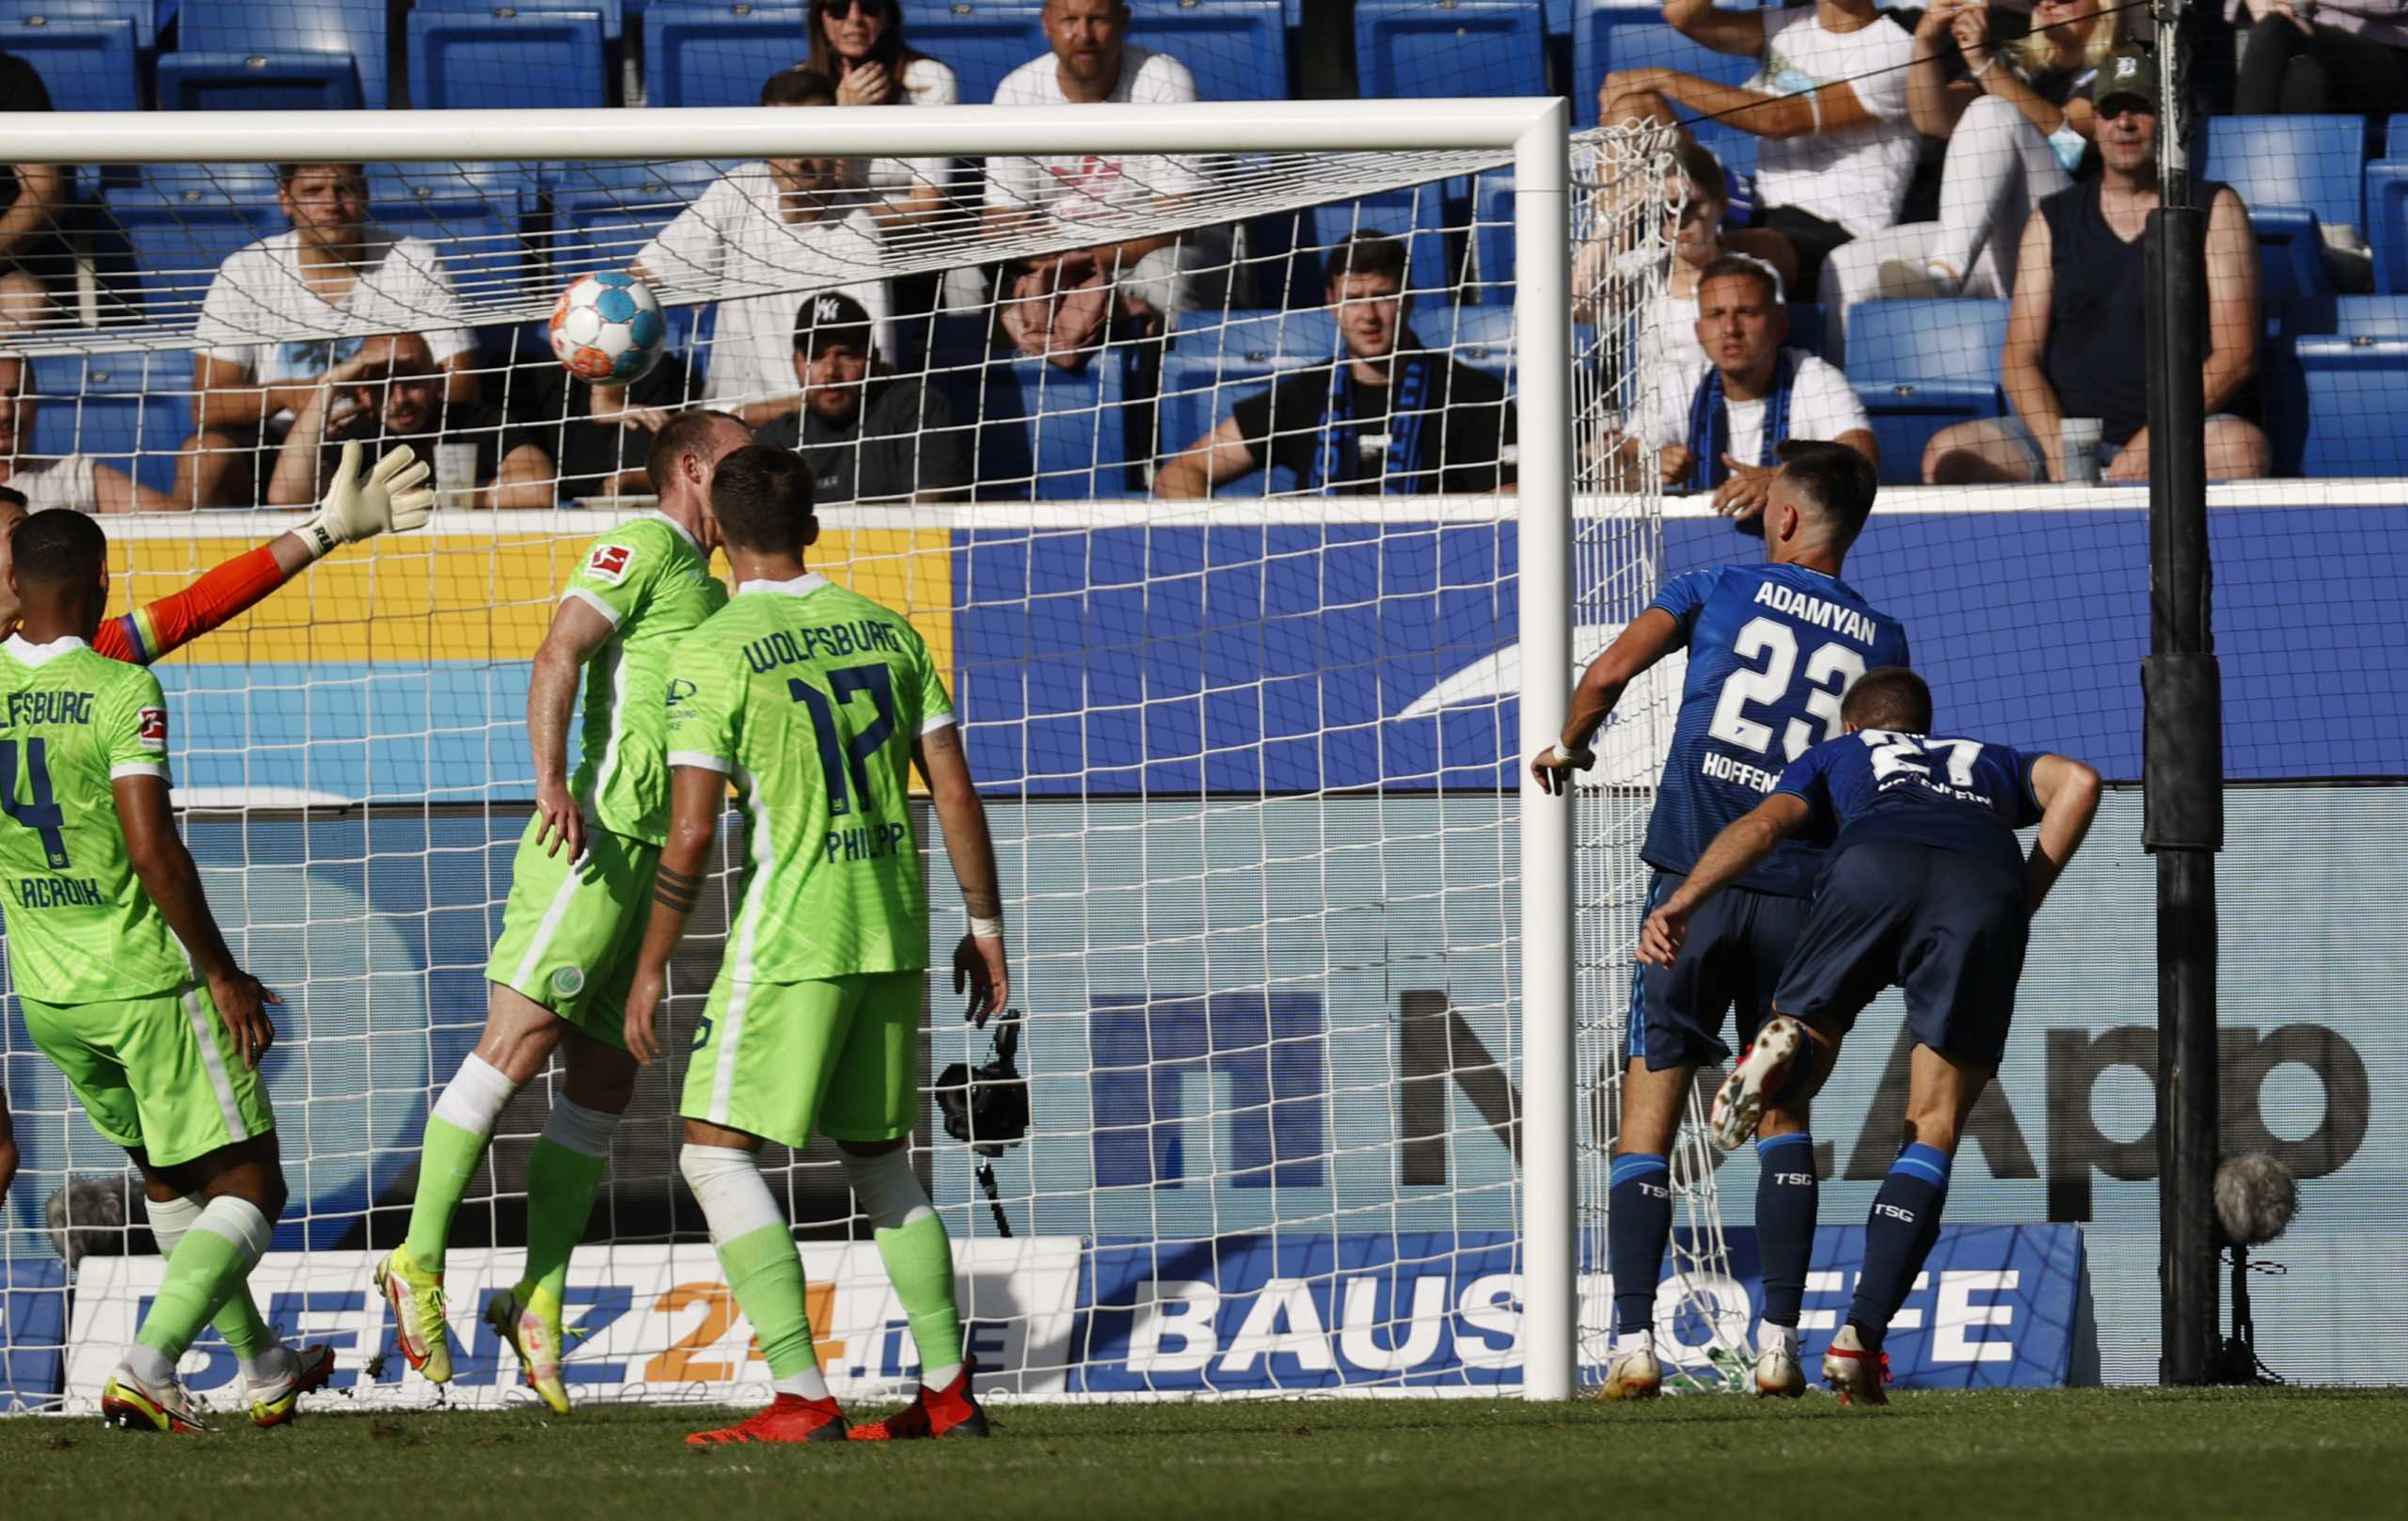 Bundesliga: Πρώτη ήττα για Βόλφσμπουργκ, την «έπιασε» η Μπάγερ Λεβερκούζεν στη δεύτερη θέση